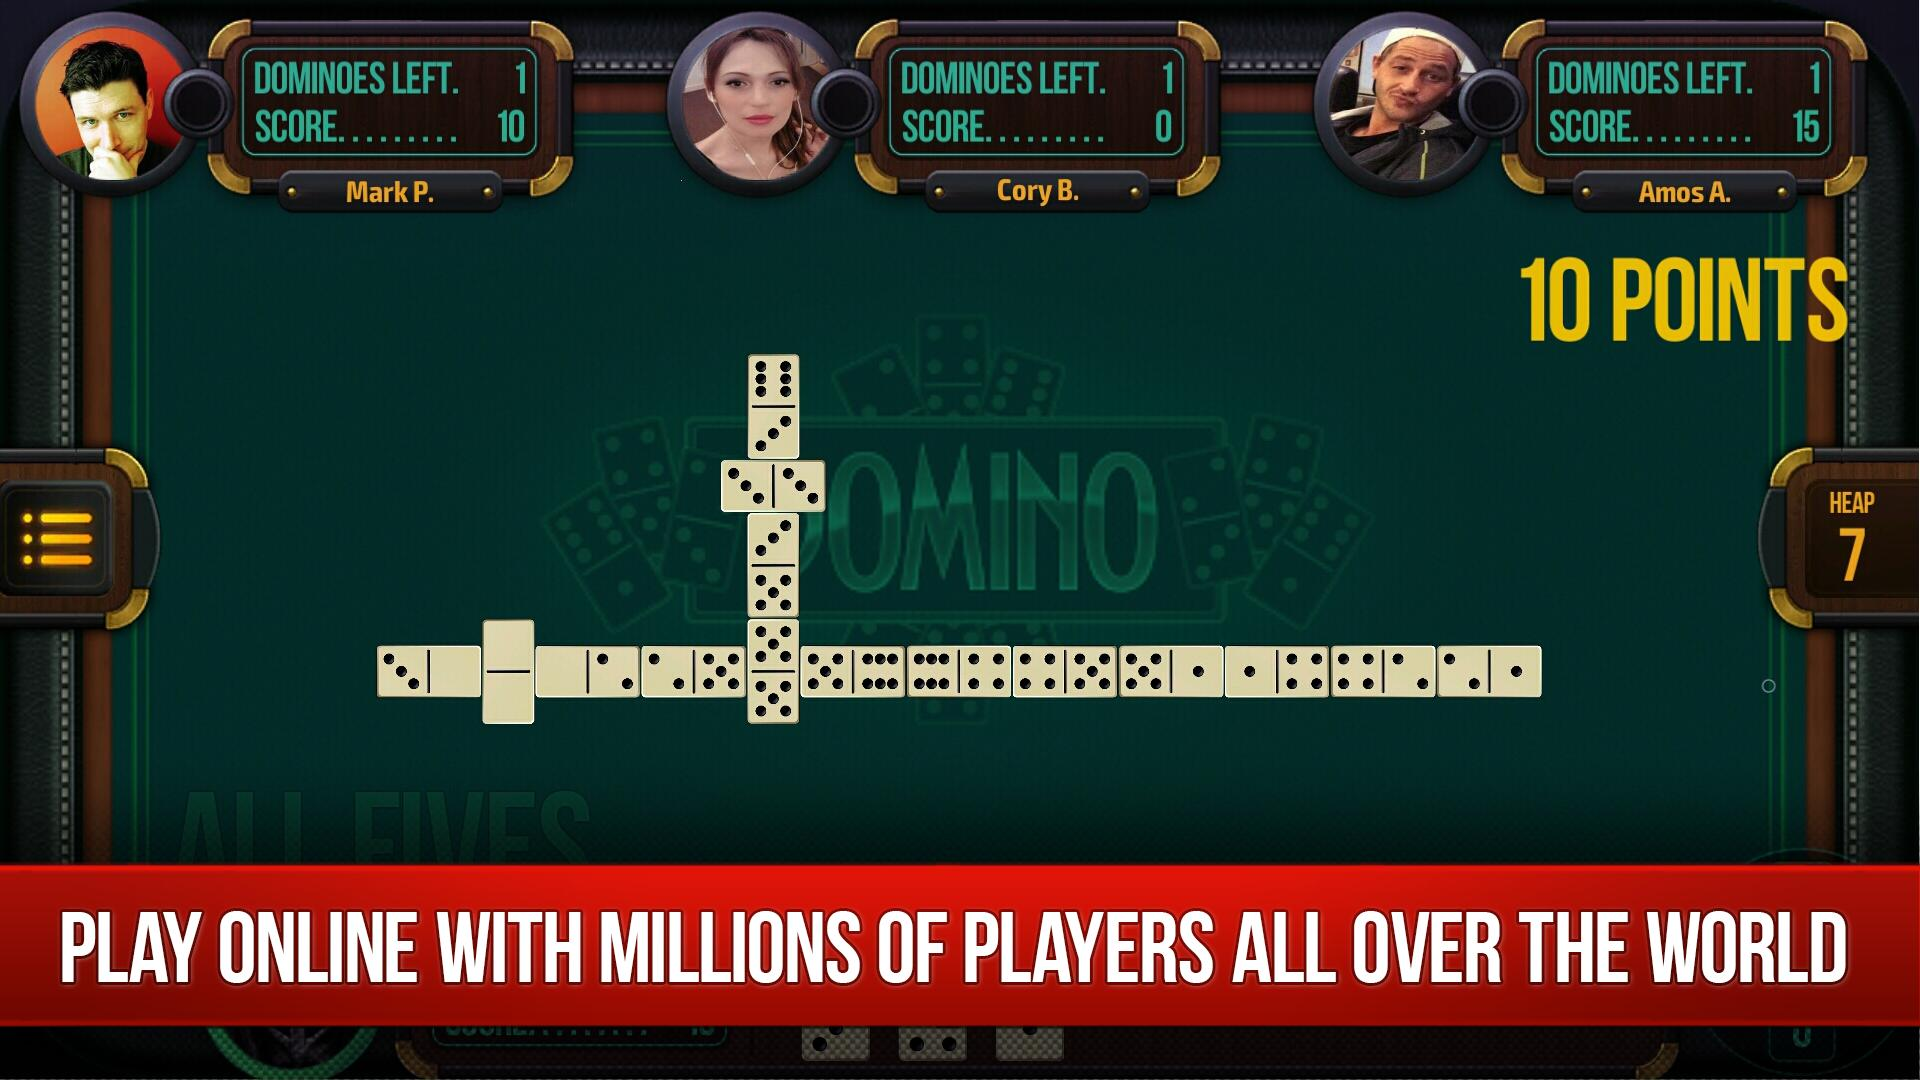 Domino - Dominoes online. Play free Dominos! 2.9.2 Screenshot 6